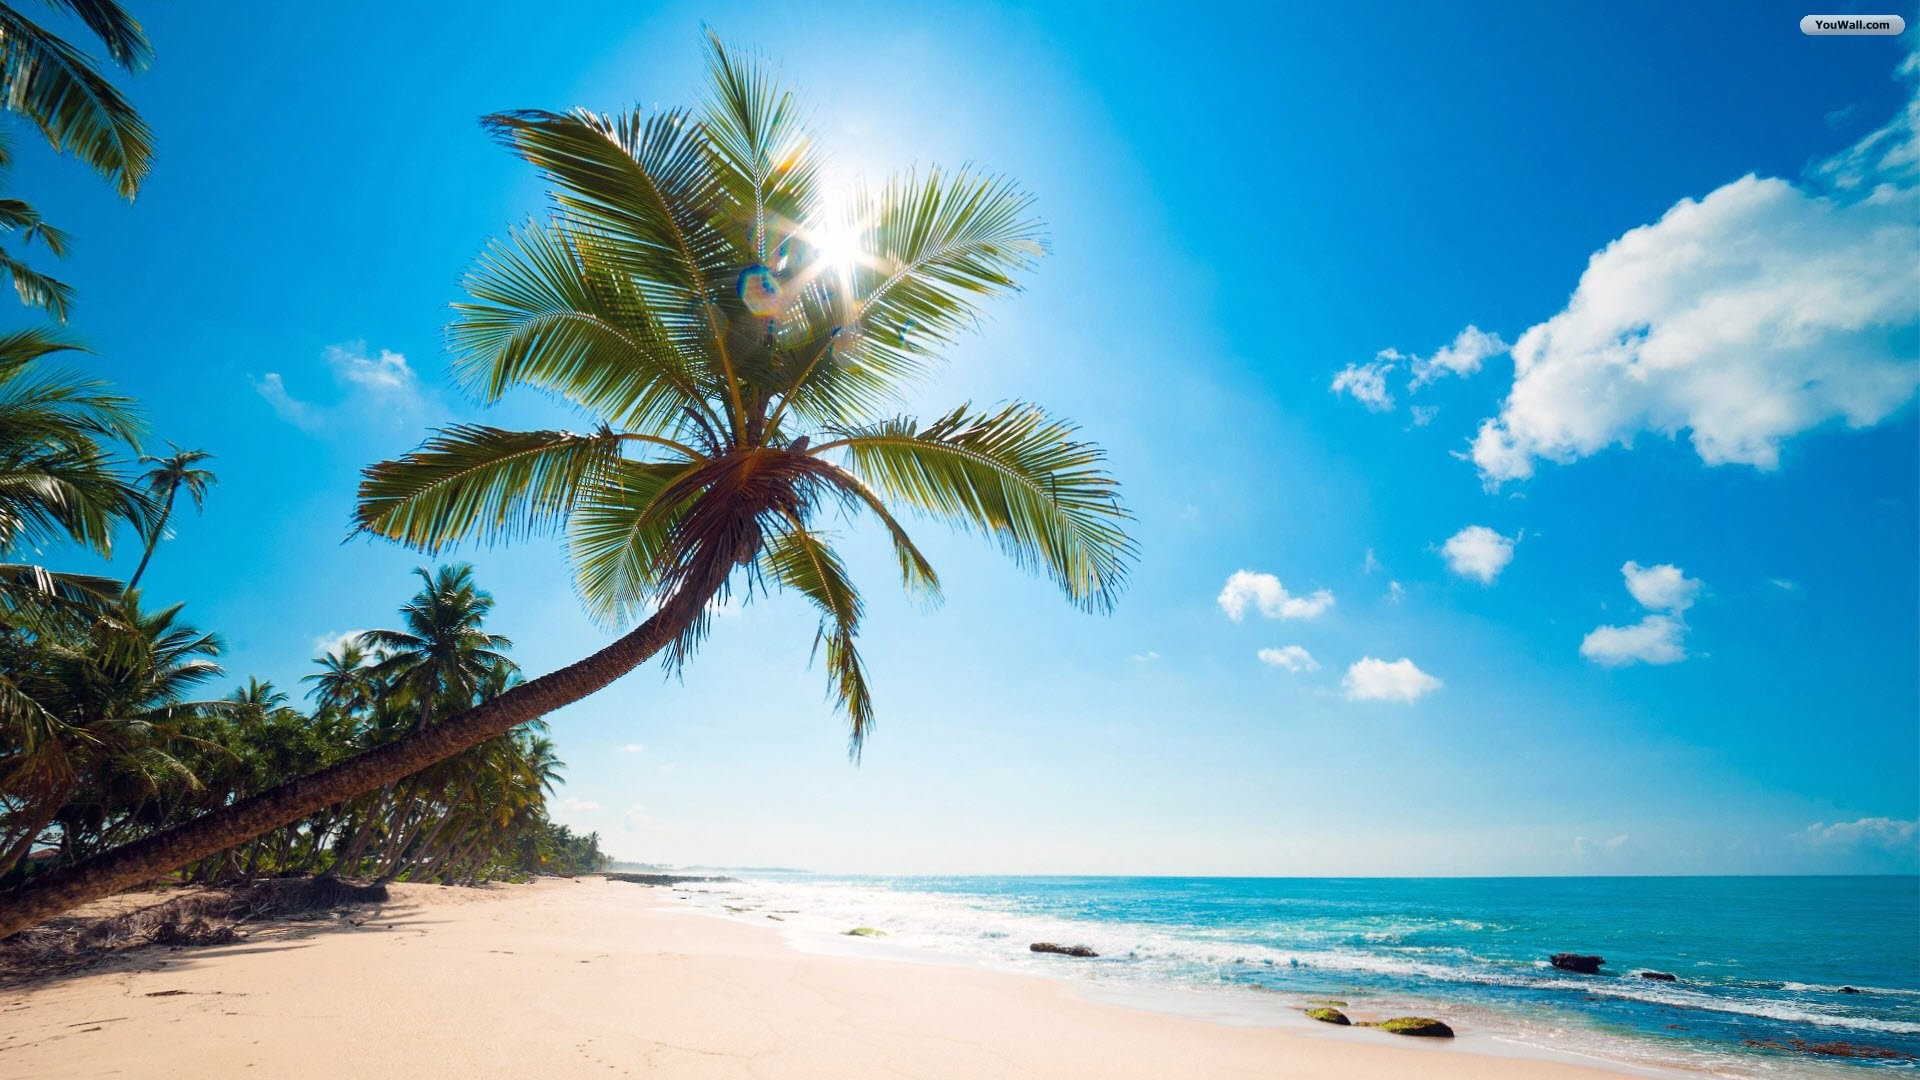 Sunny Tropical Beach Wallpaper – wallpaper,wallpapers,free wallpaper .